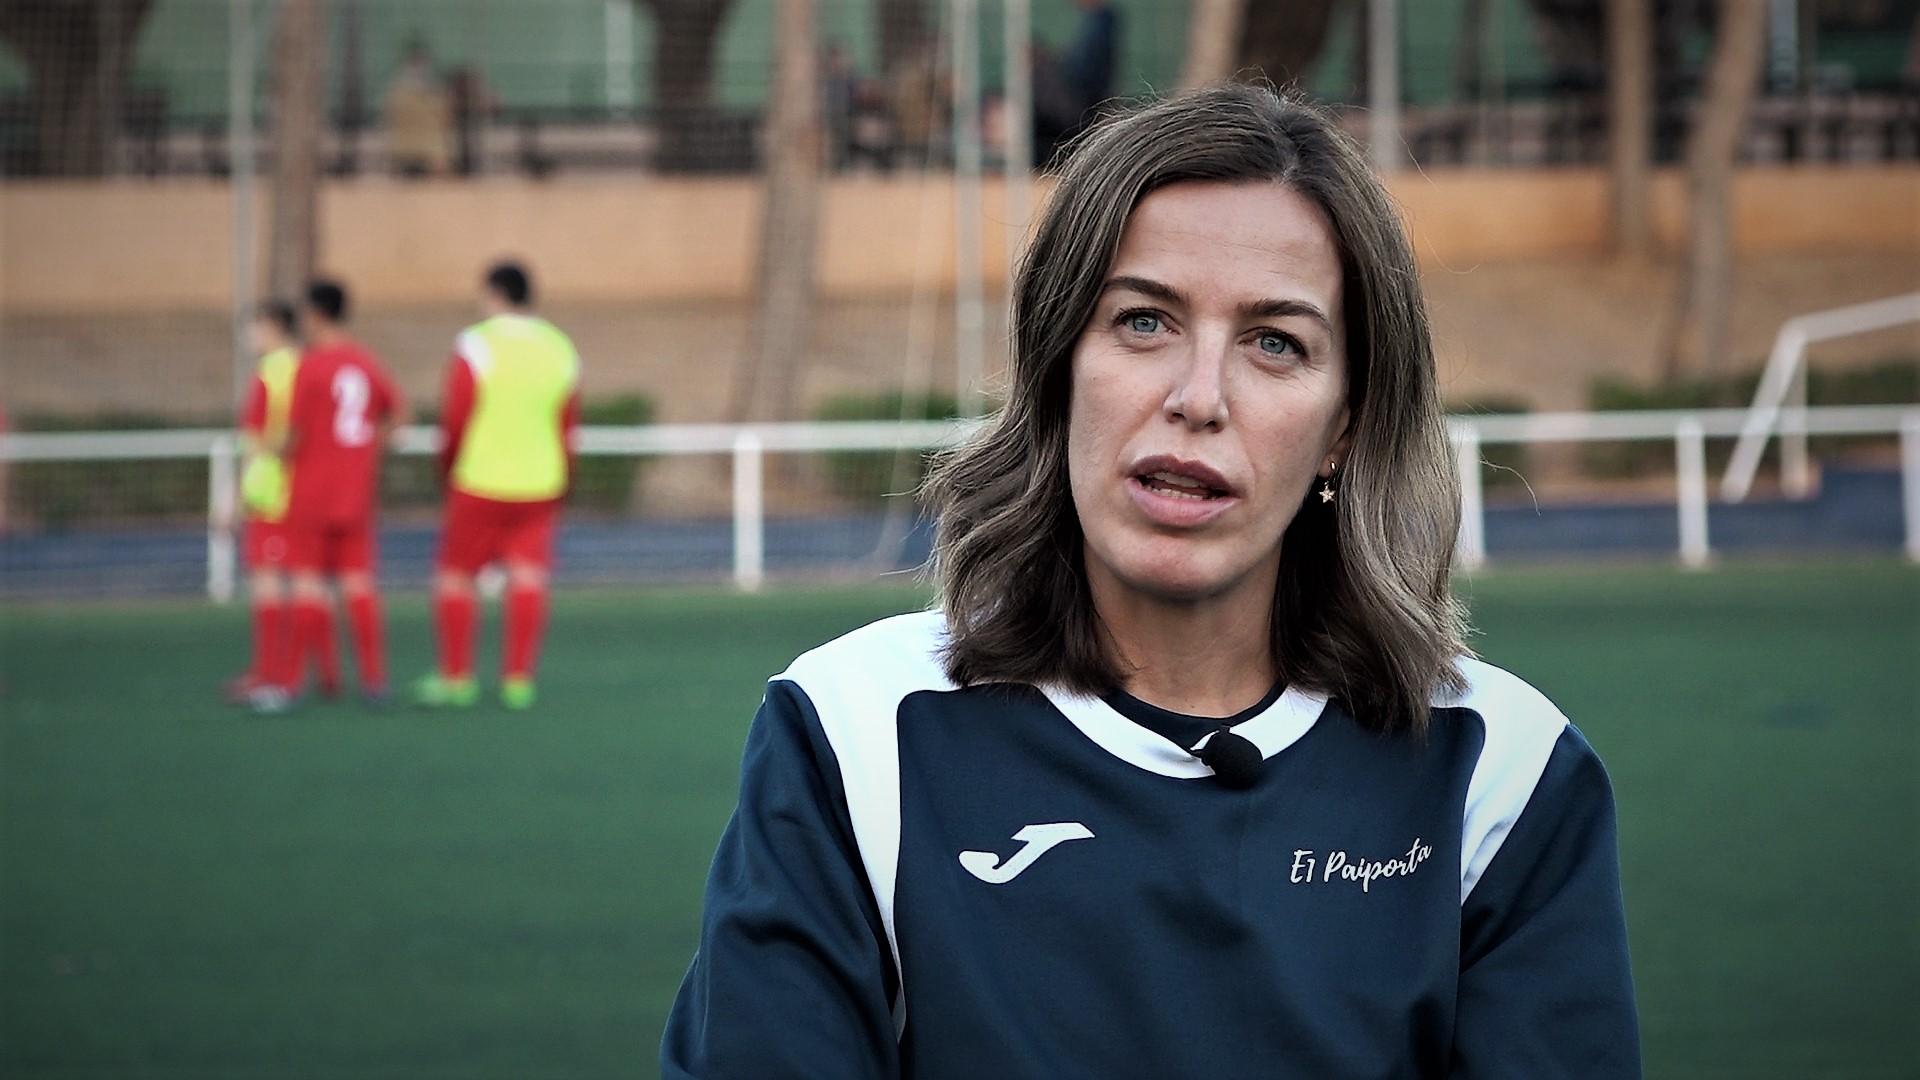 6 dic Santa Tortajada, coach educativo E1 Valencia